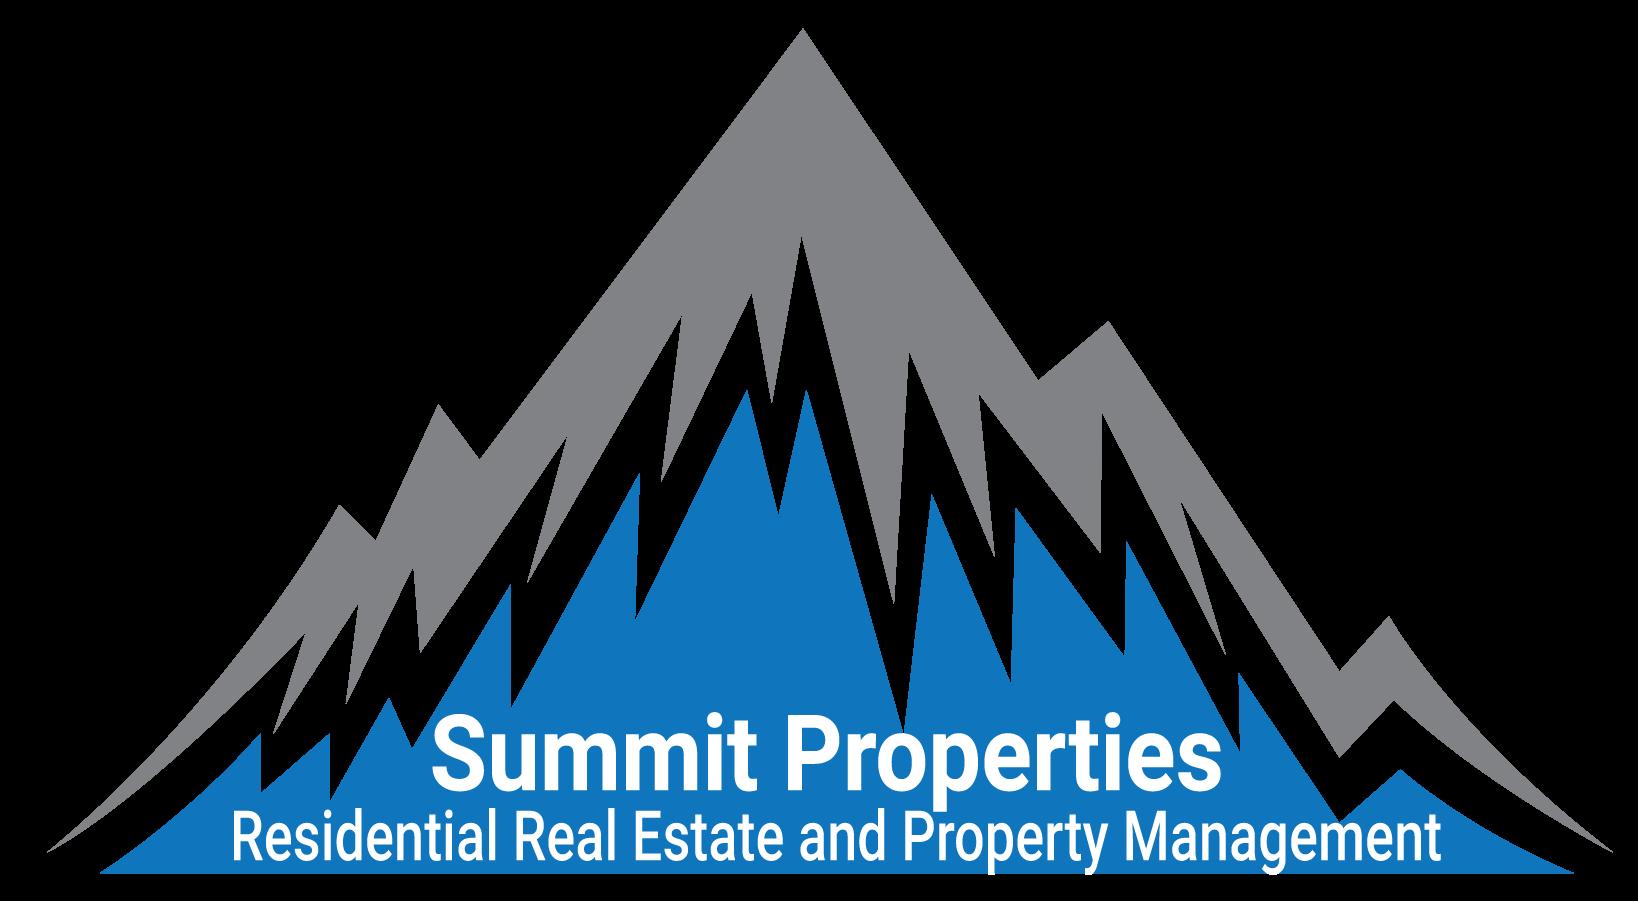 Summitproperties8 (4)